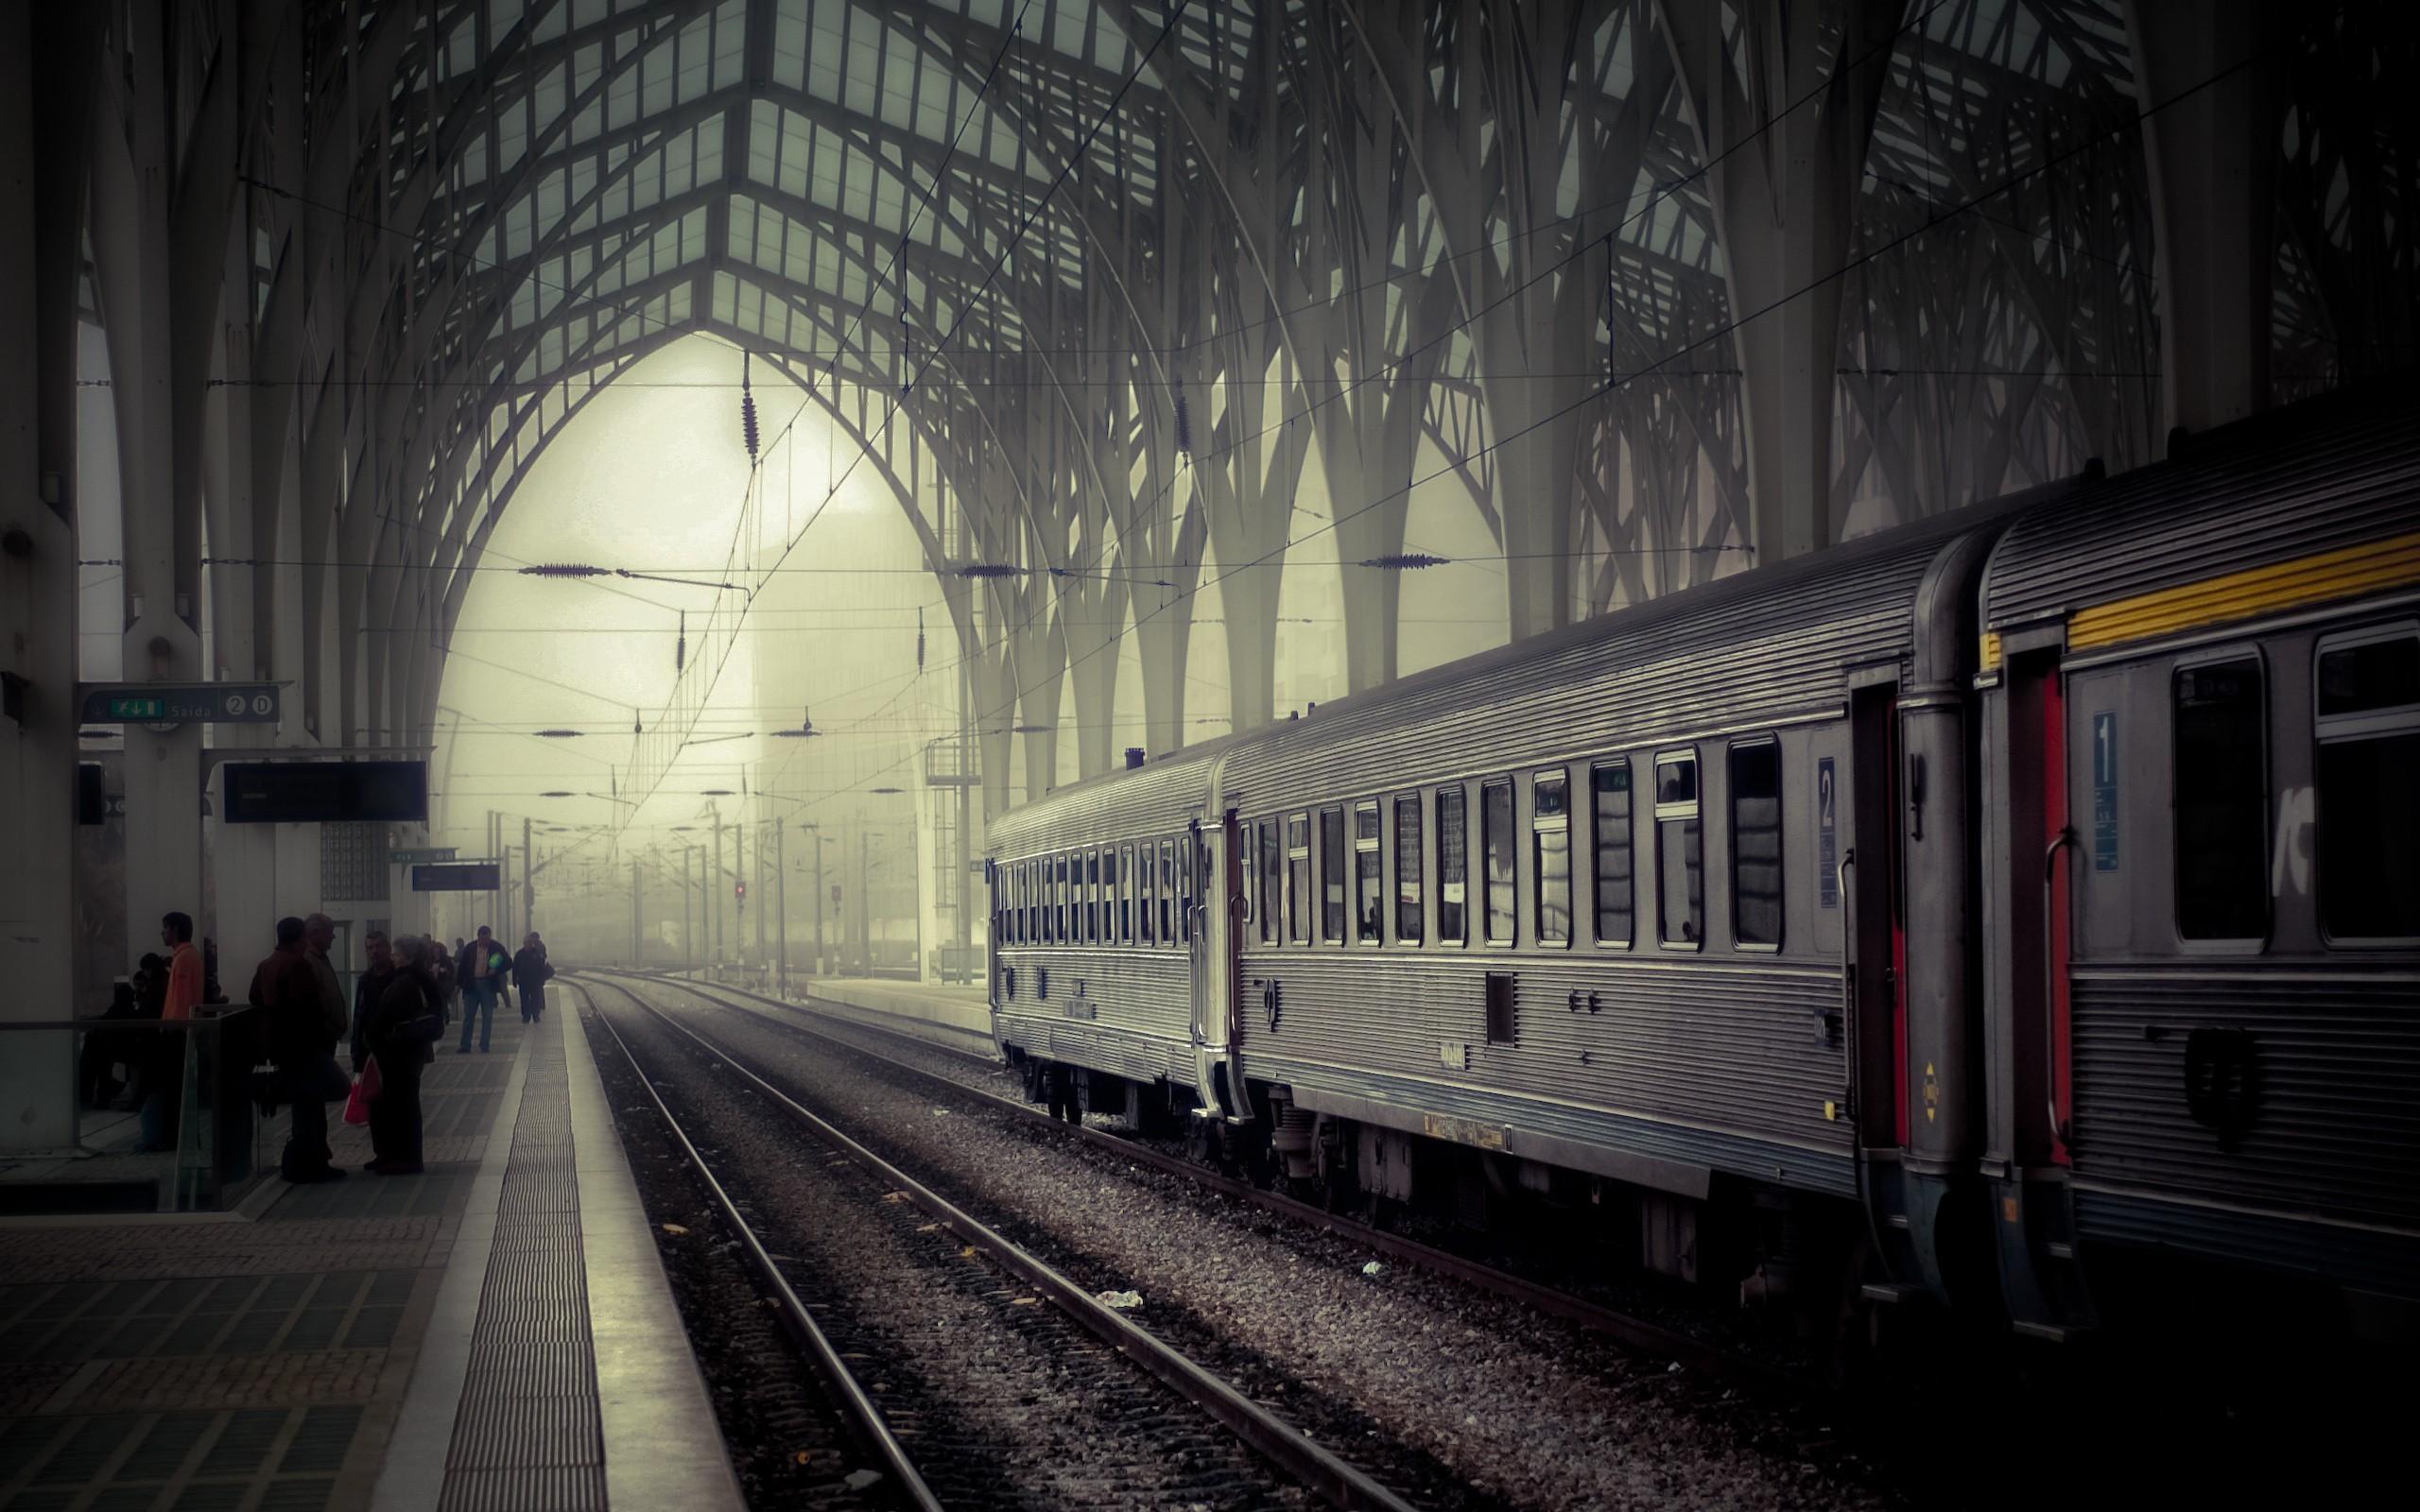 Train Station Wallpaper Background 49177